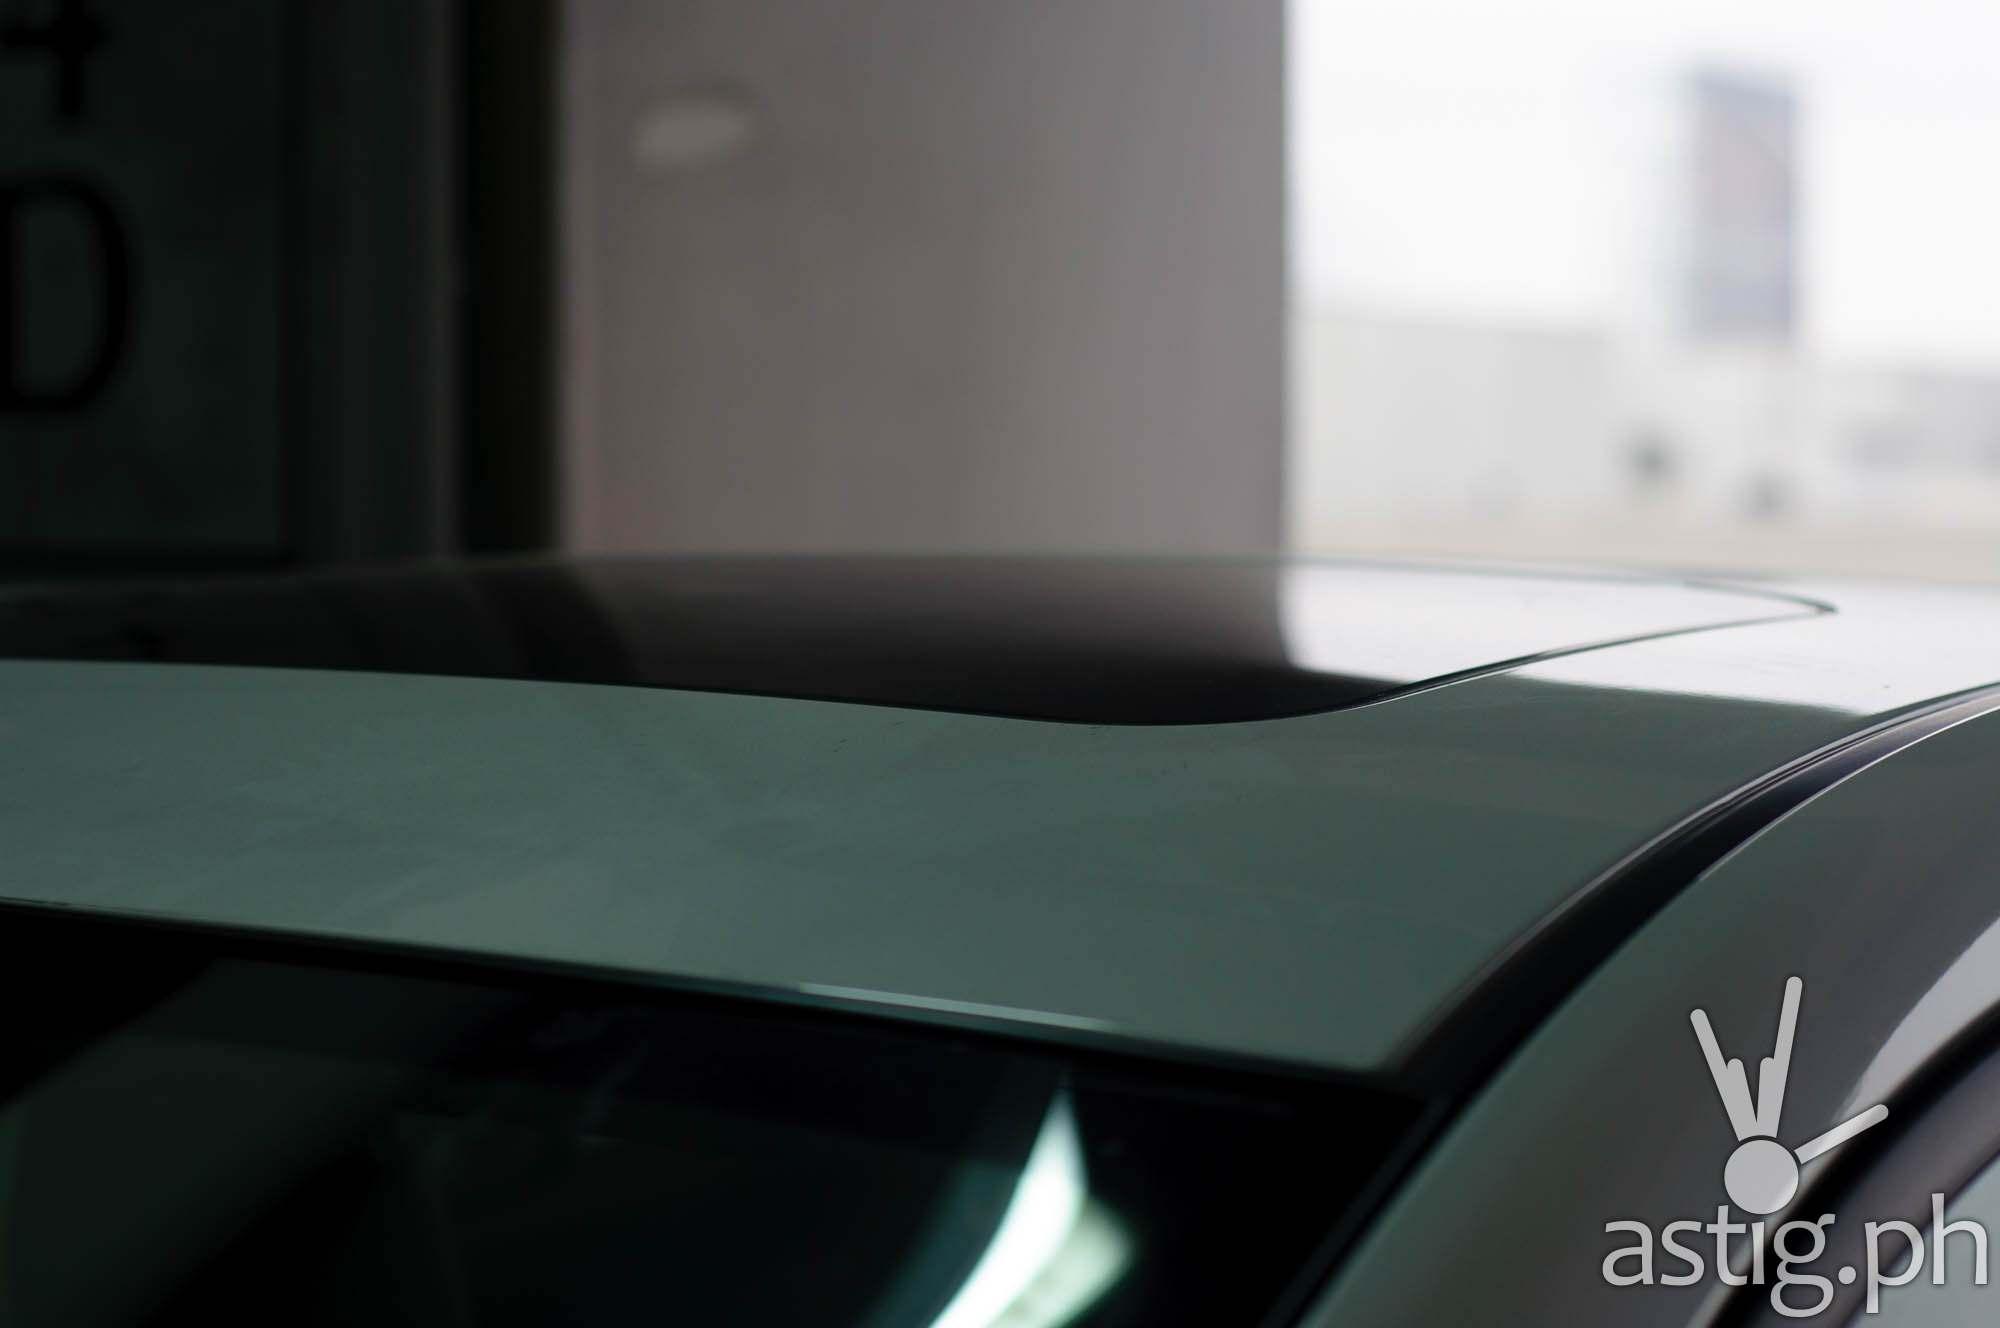 Sunroof shot from the top - Mazda3 2.0 Sedan 2017 Skyactiv-R